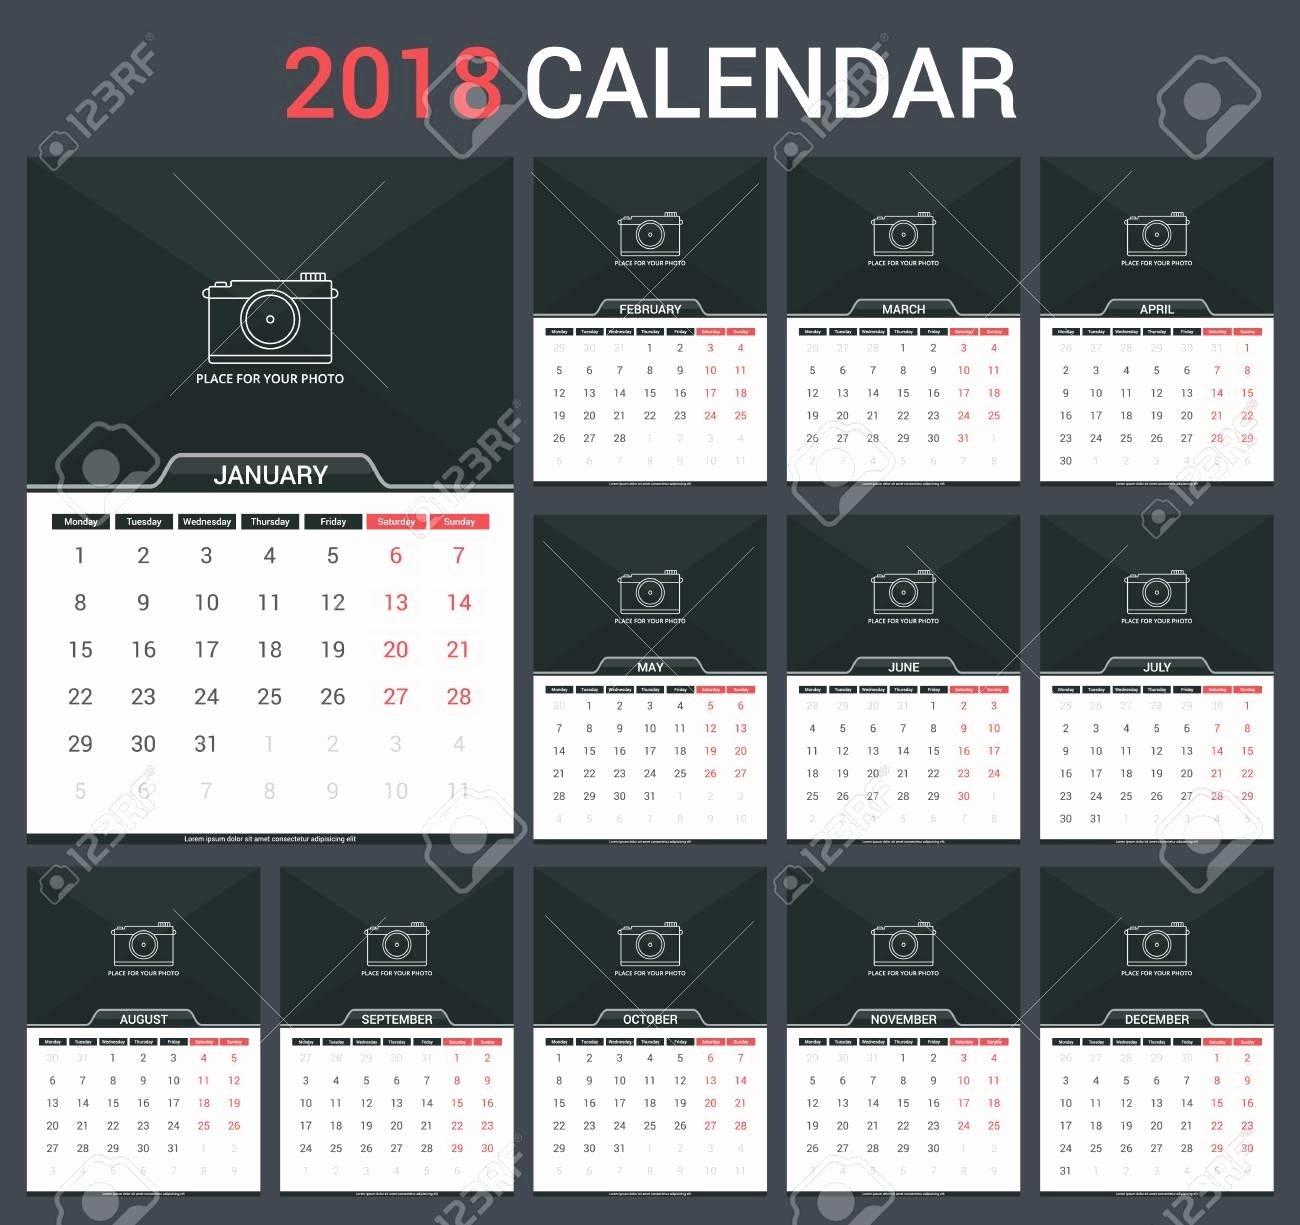 Calendar Template for Pages Mac Fresh Calendar Template for Mac Pages Free Archives Calendar